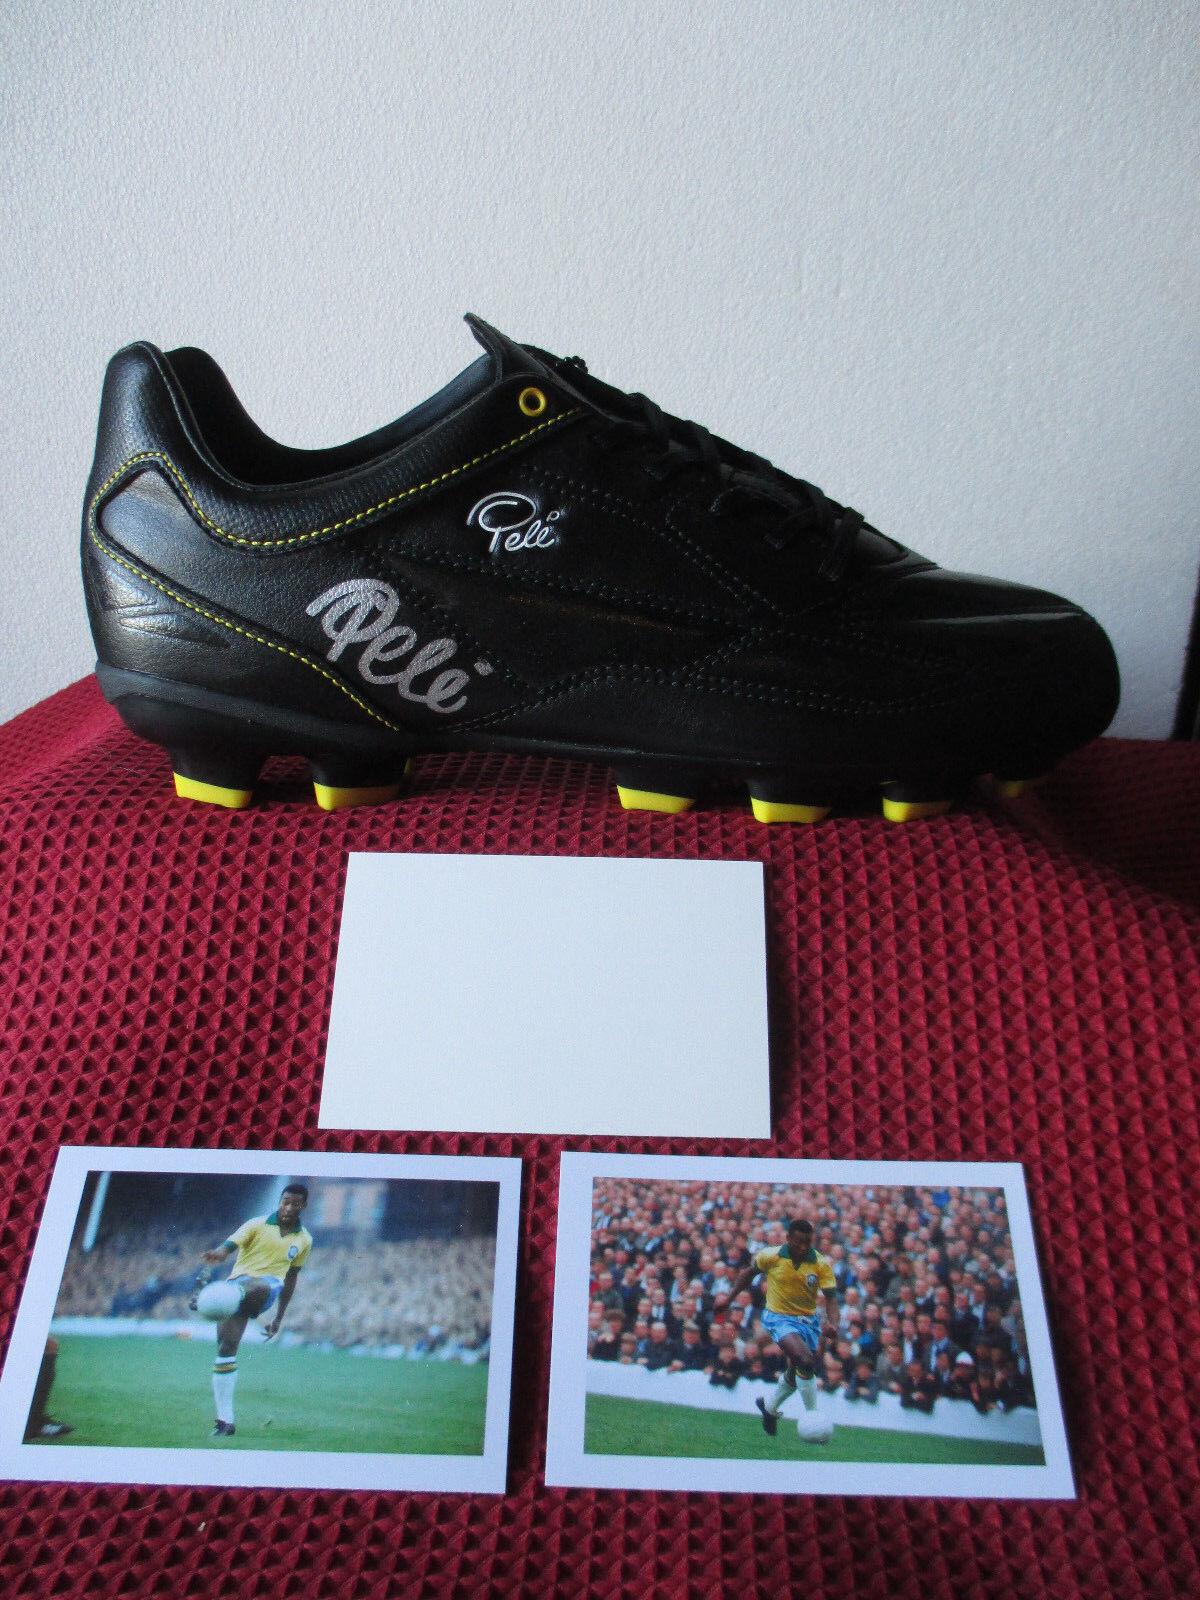 Brasil Legend  Pele  Genuine & personalmente firmado coincide con bota-foto prueba